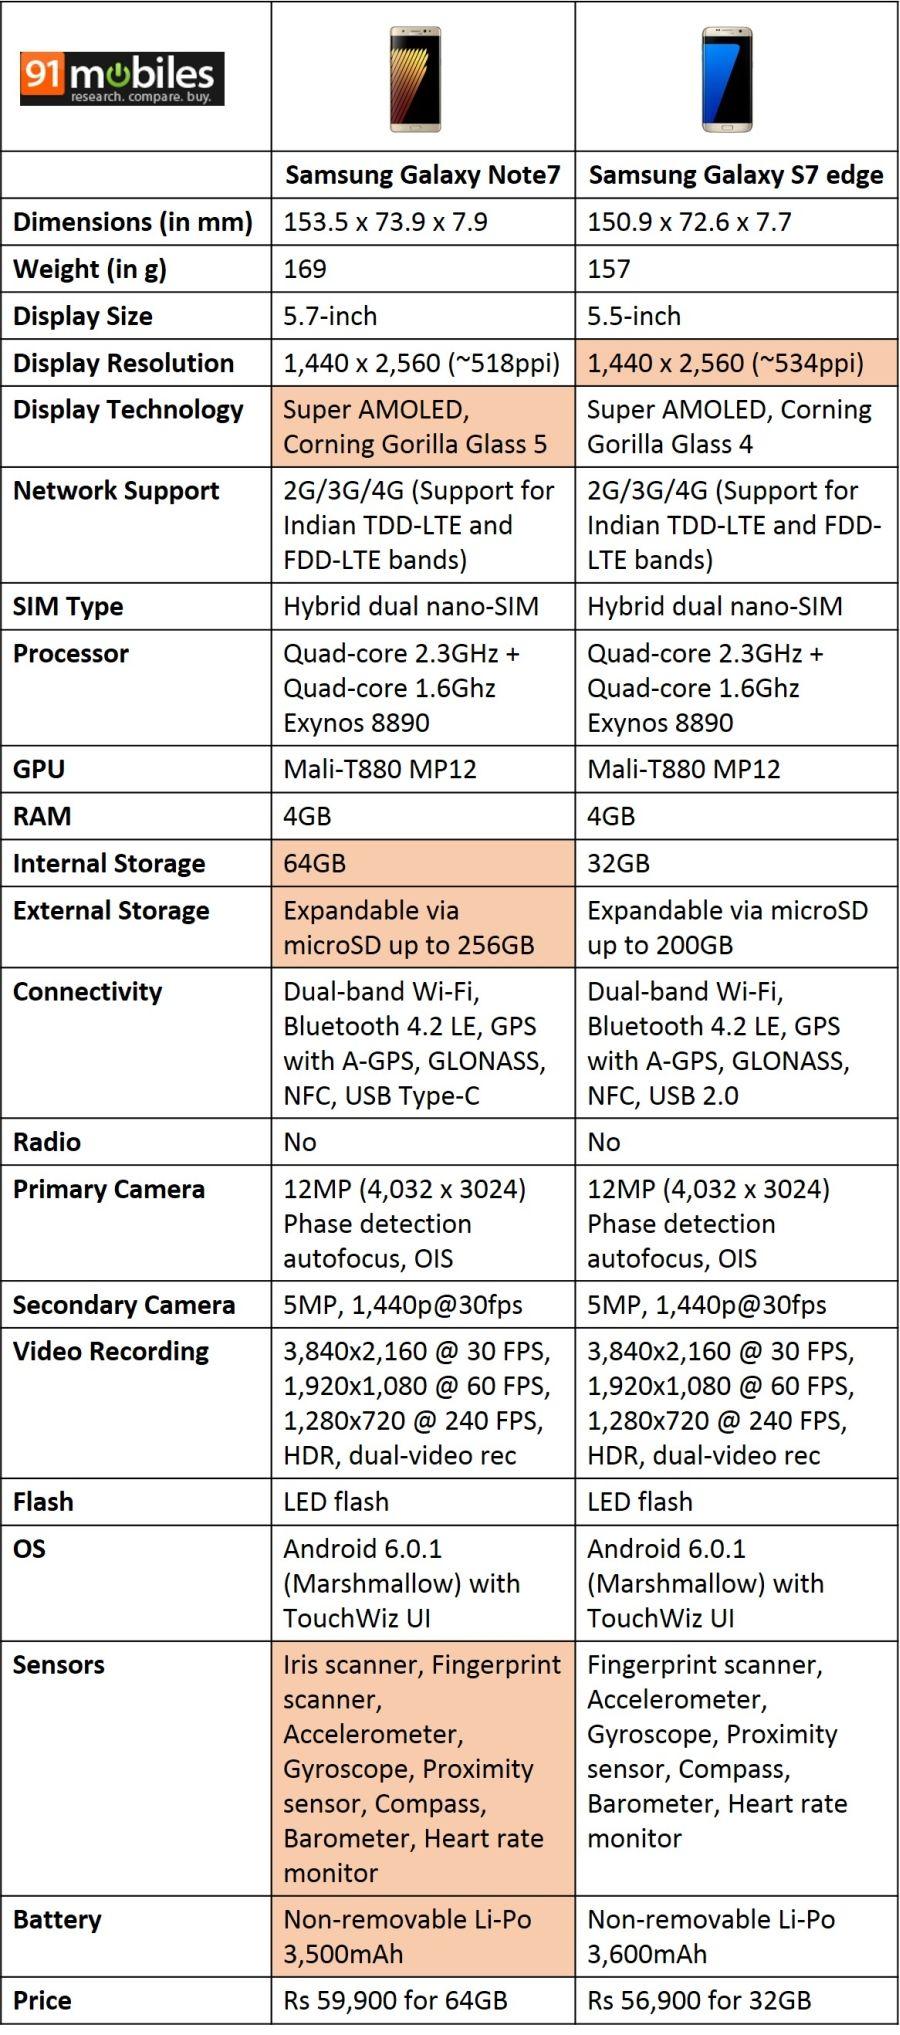 Samsung-Galaxy-Note7-vs-Samsung-Galaxy-S7-edge